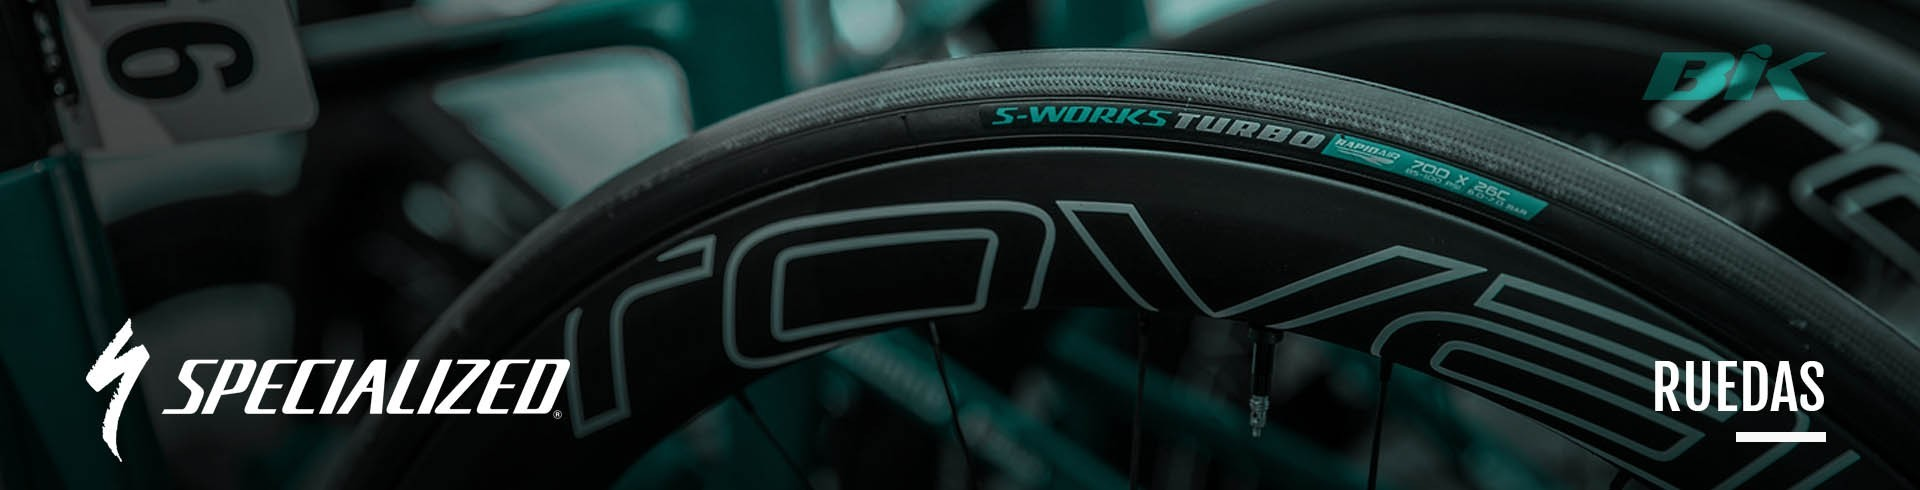 Bike wheels Roval - road